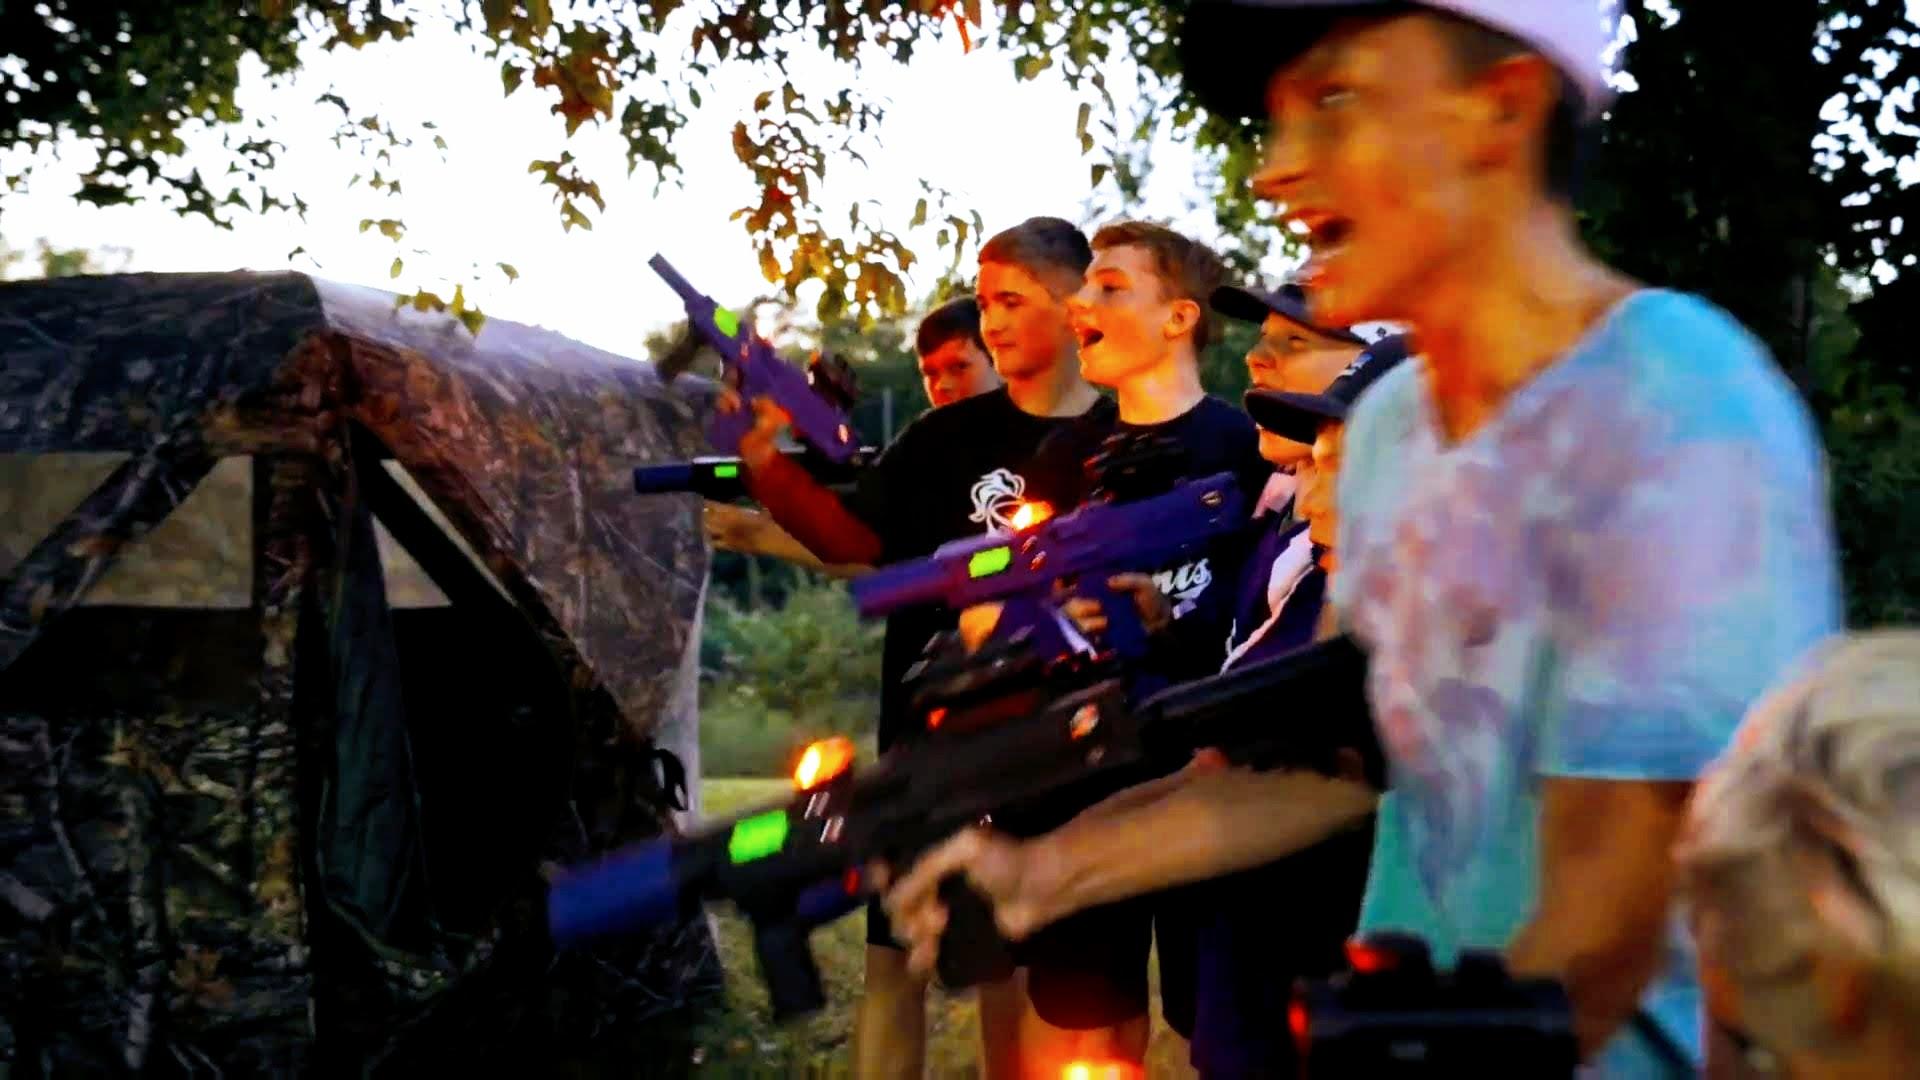 laser tag lazer tag mobile battlefield backyard fun